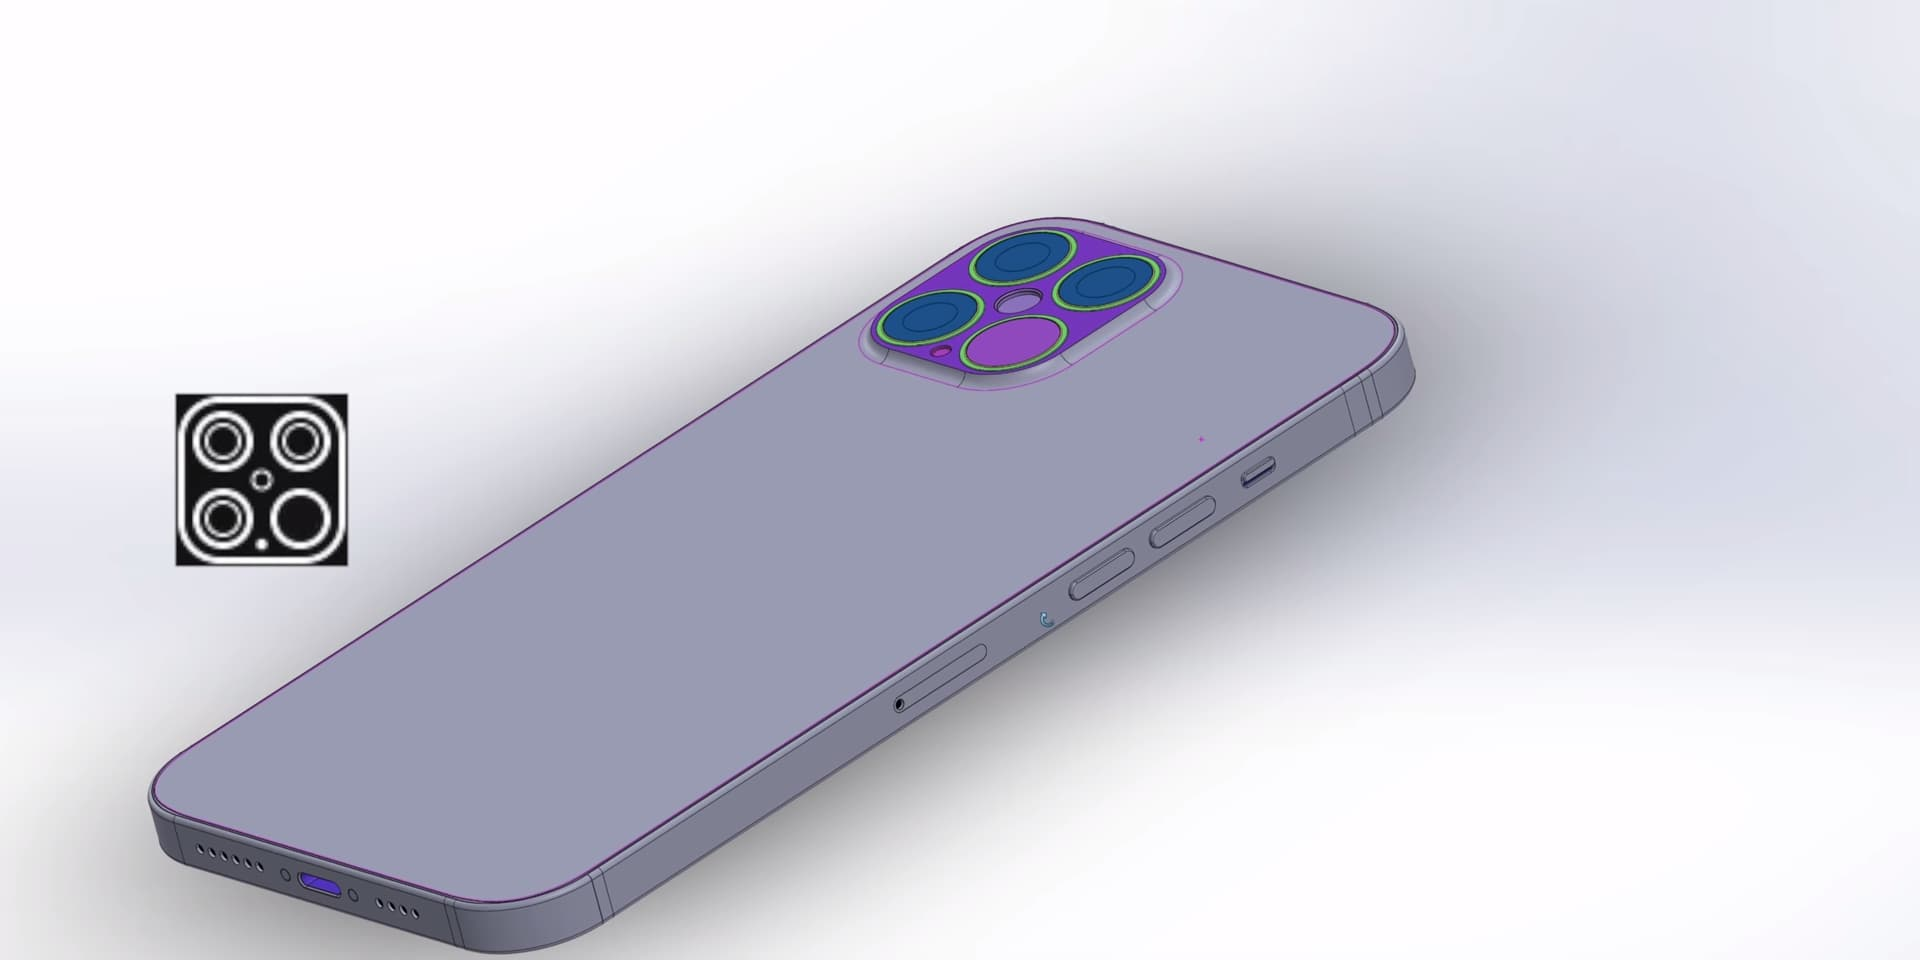 iPhone 12 外觀將回歸賈伯斯最終 iPhone 5 設計美學